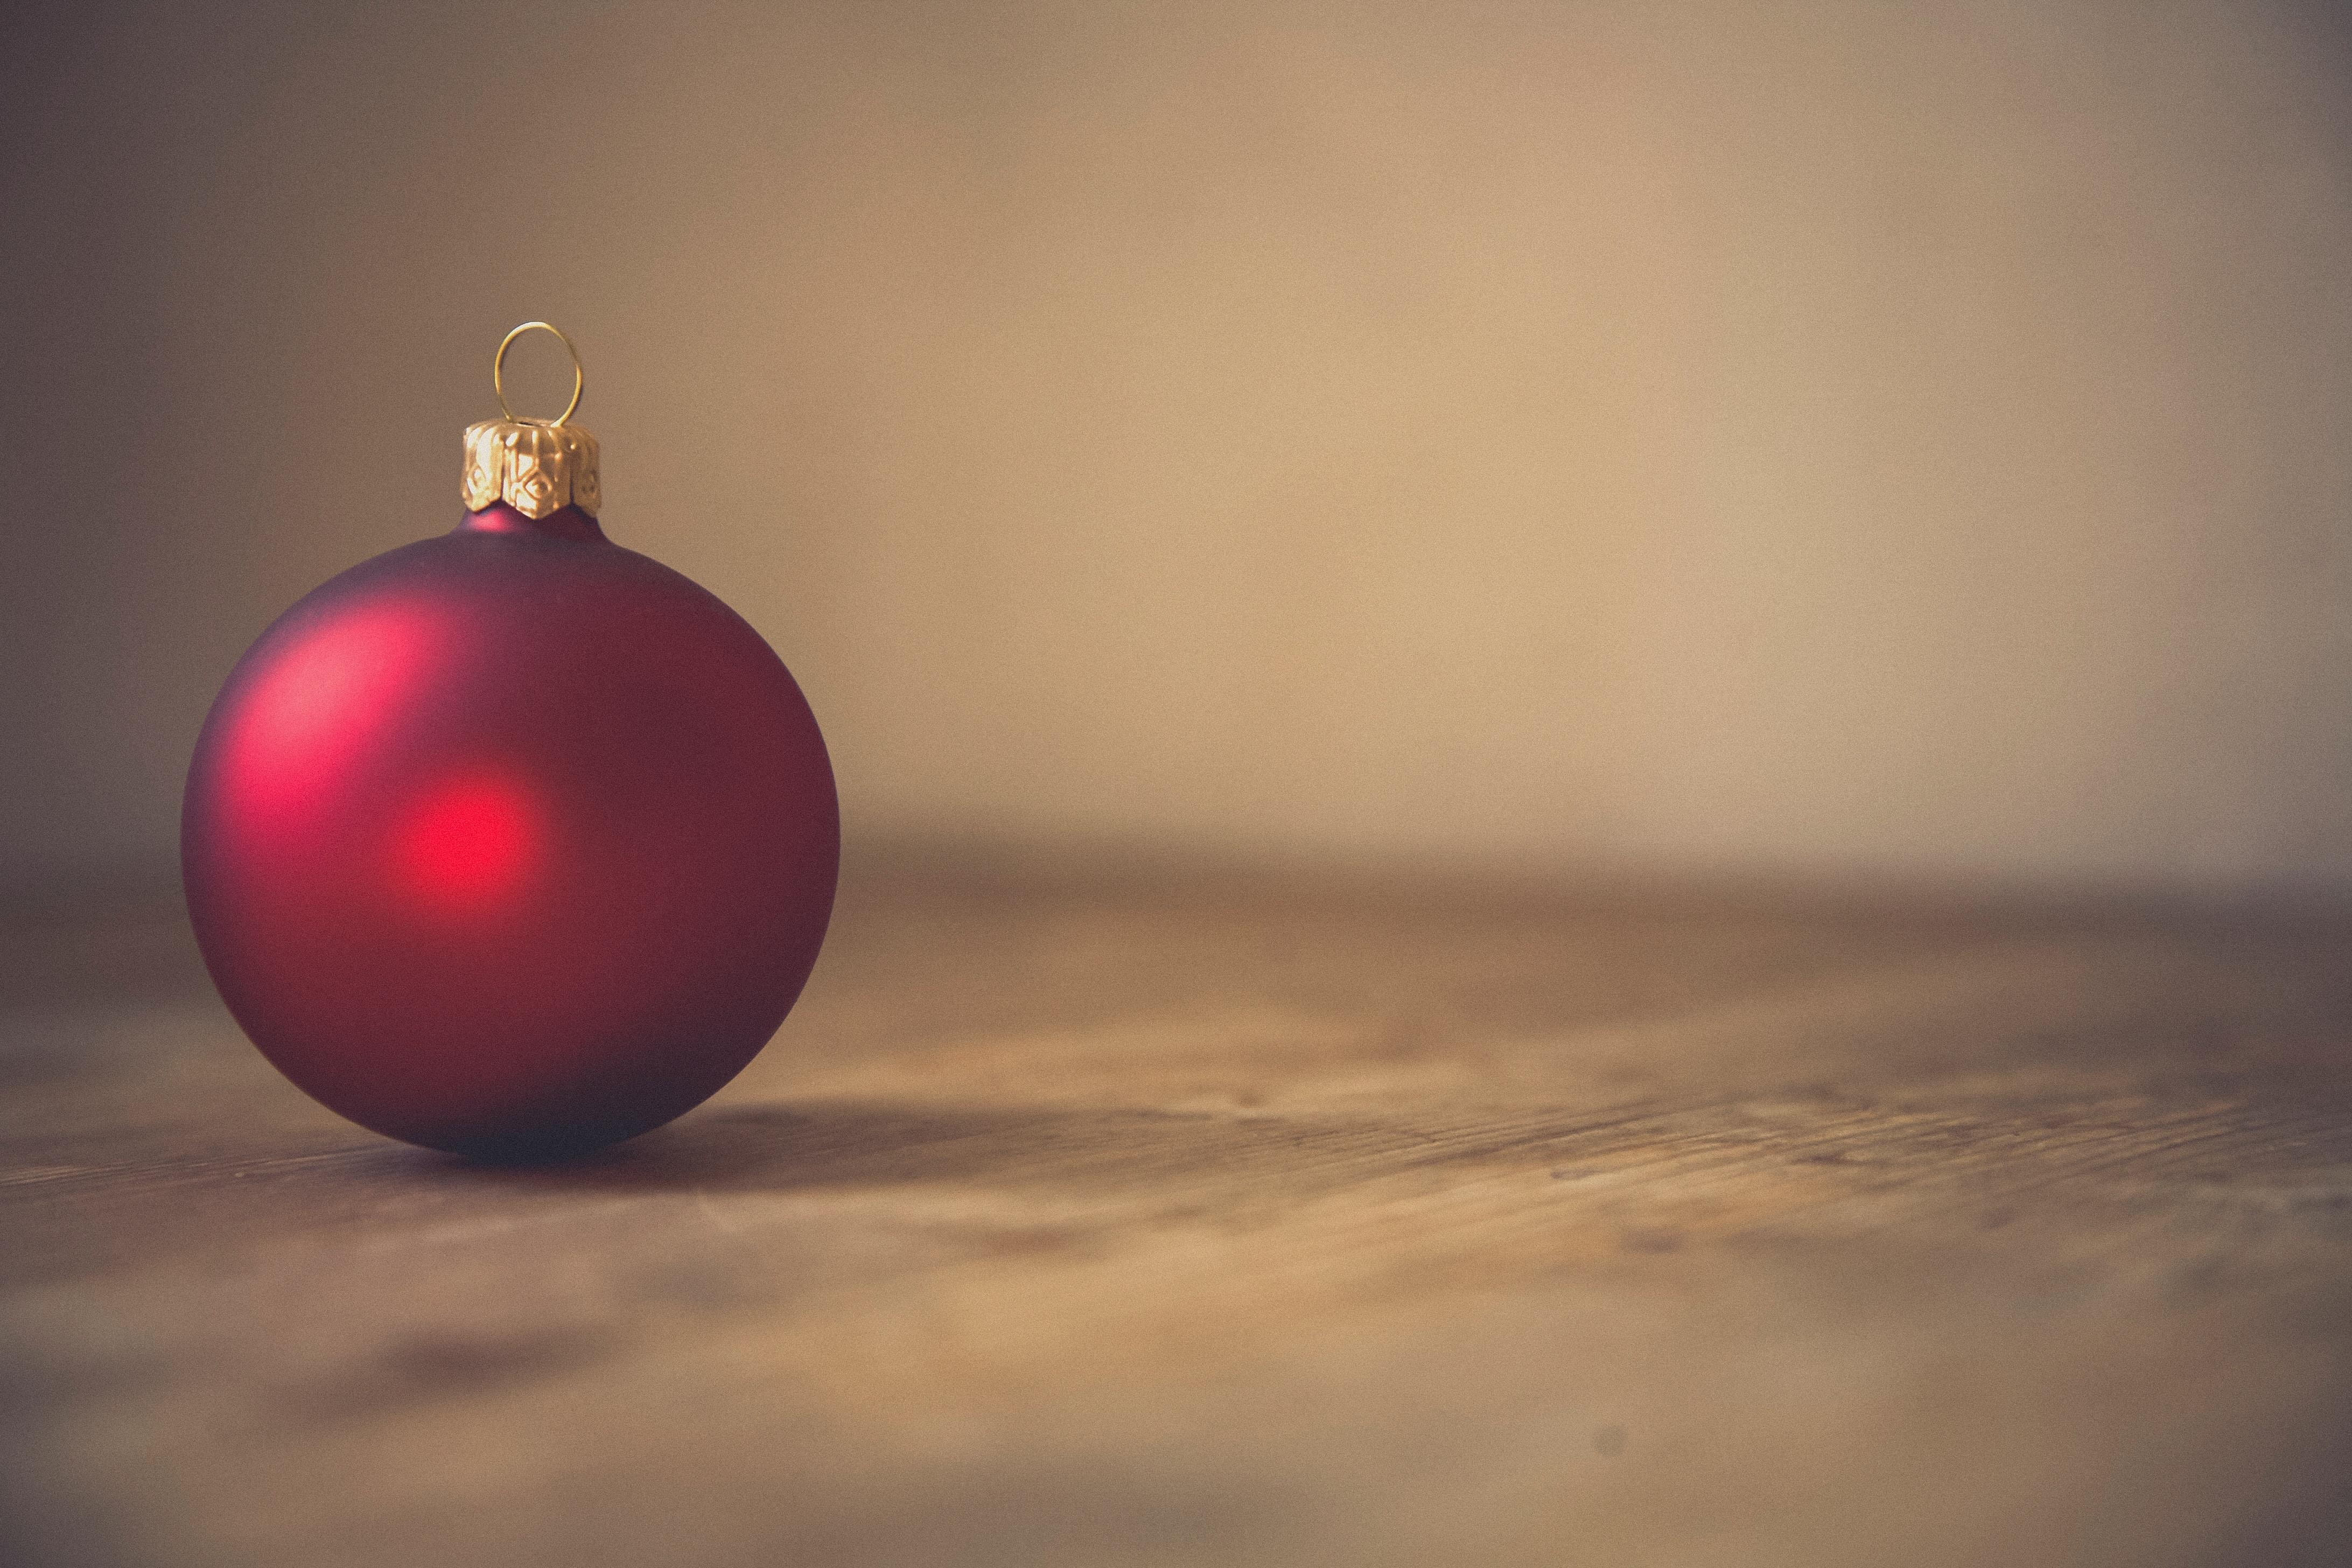 Psychology of the Holiday Season